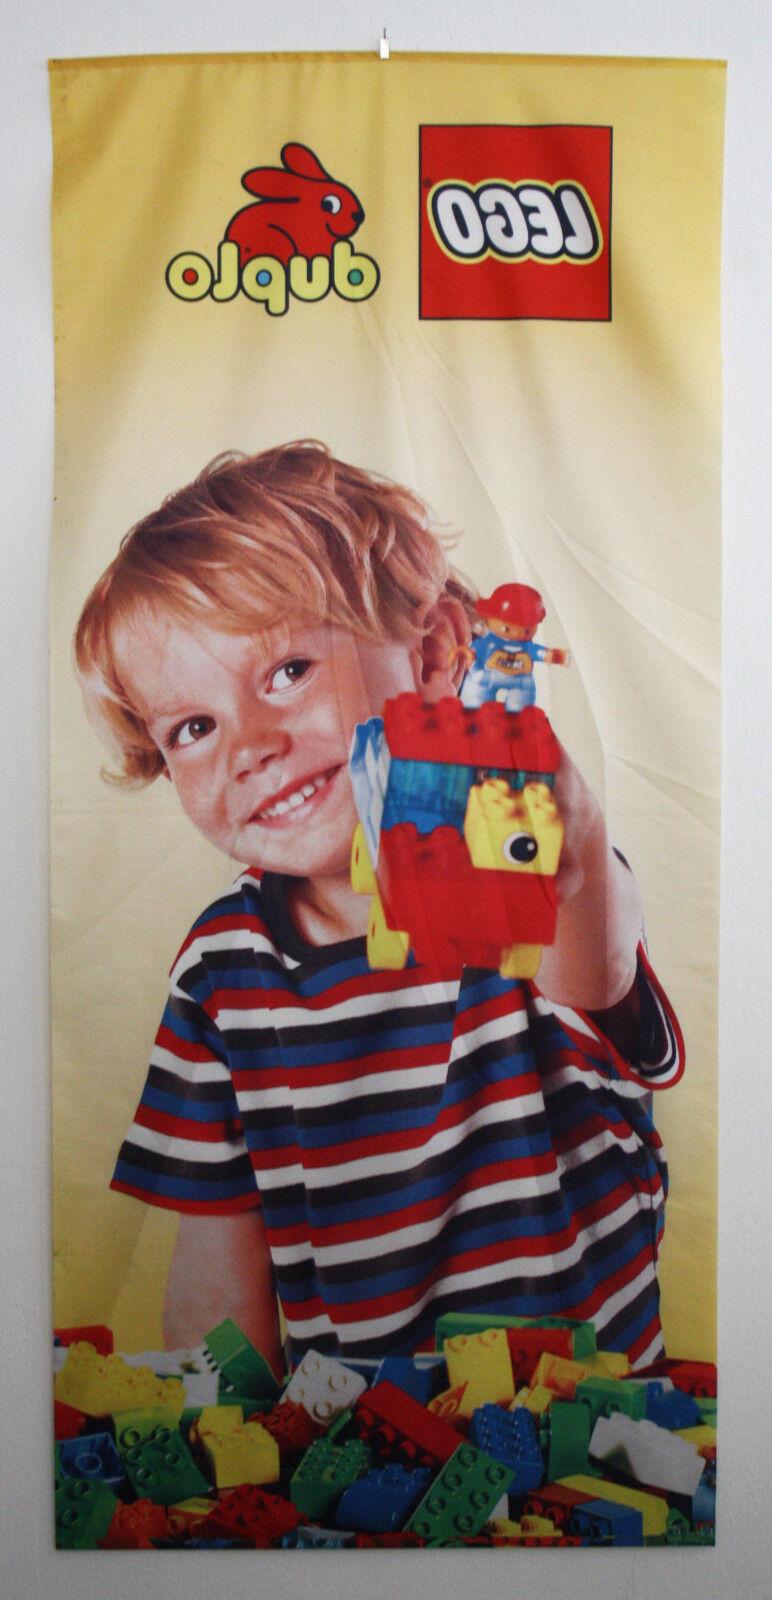 LEGO DUPLO DOUBLE SIDE SHOP DISPLAY BANNER 89cm 89cm 89cm X 2m   9515c3